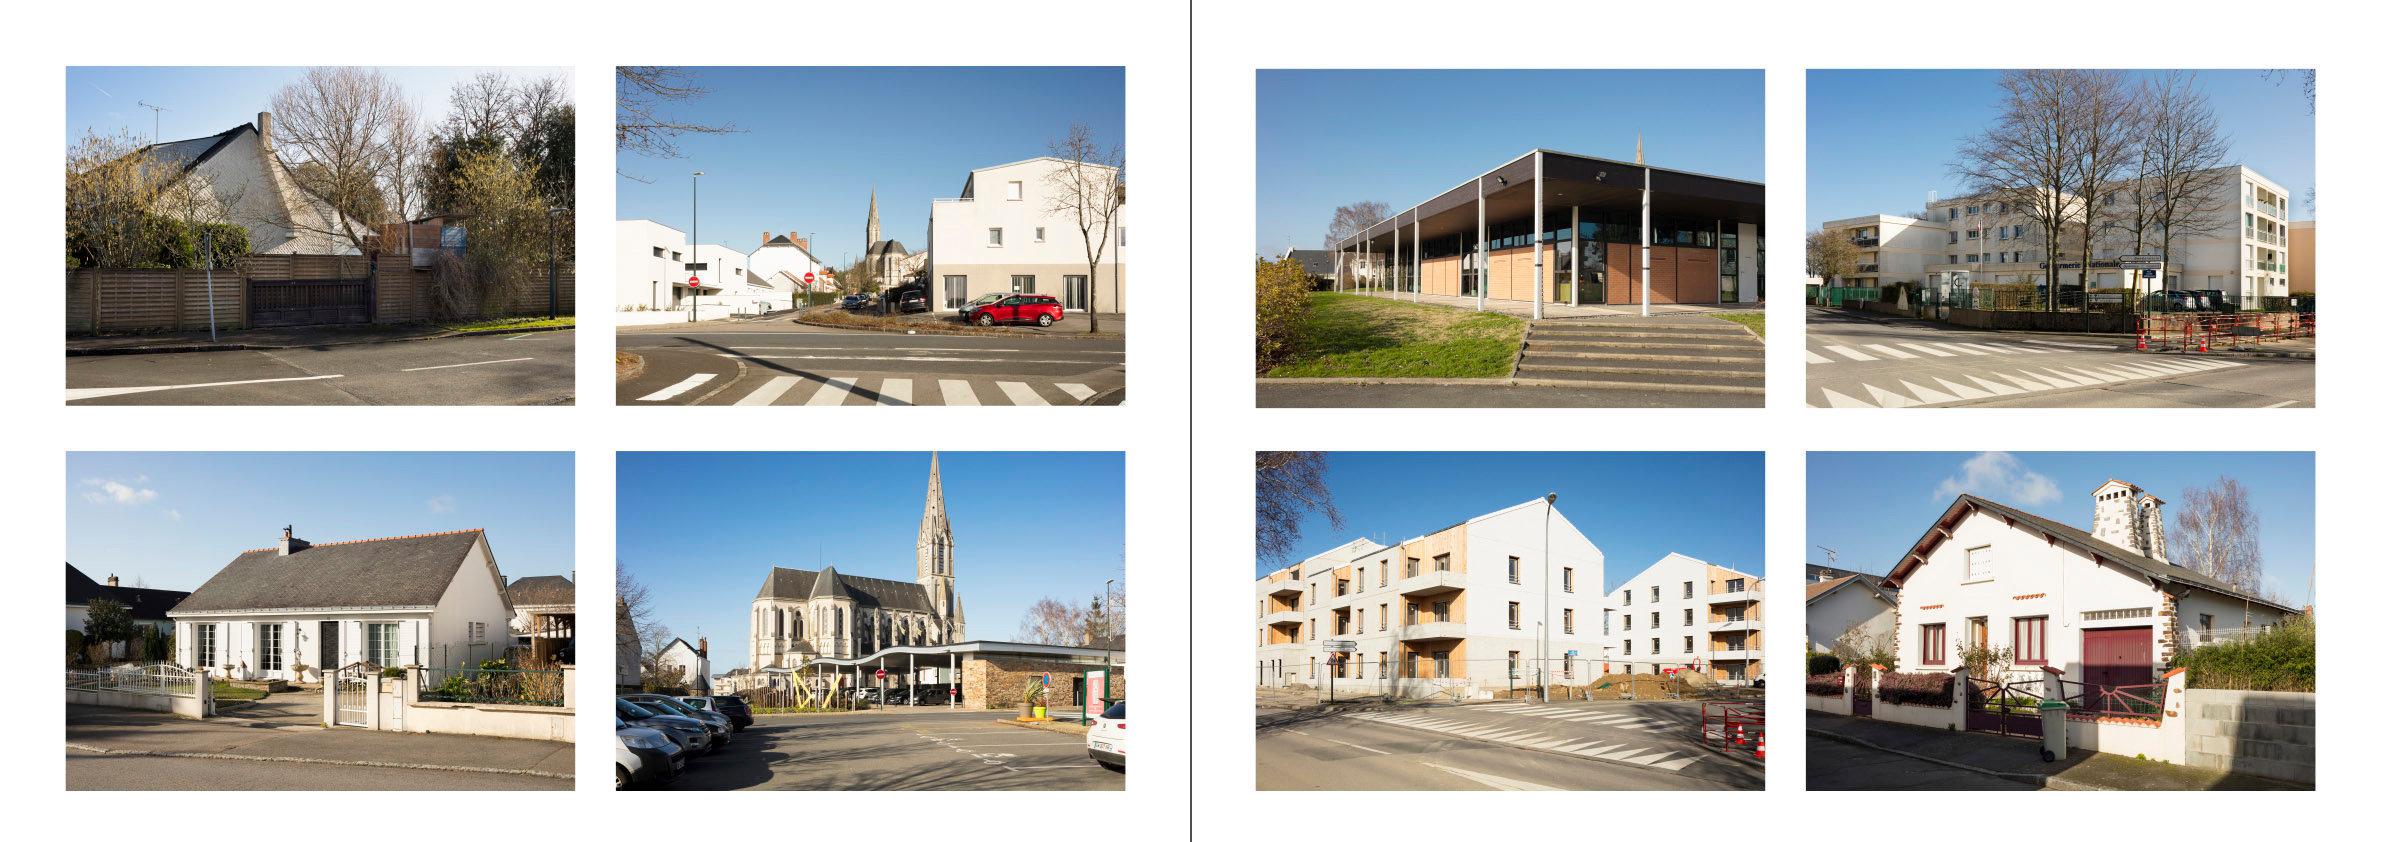 Nantes-Carquefou-Ste Luce A3-page041.jpeg